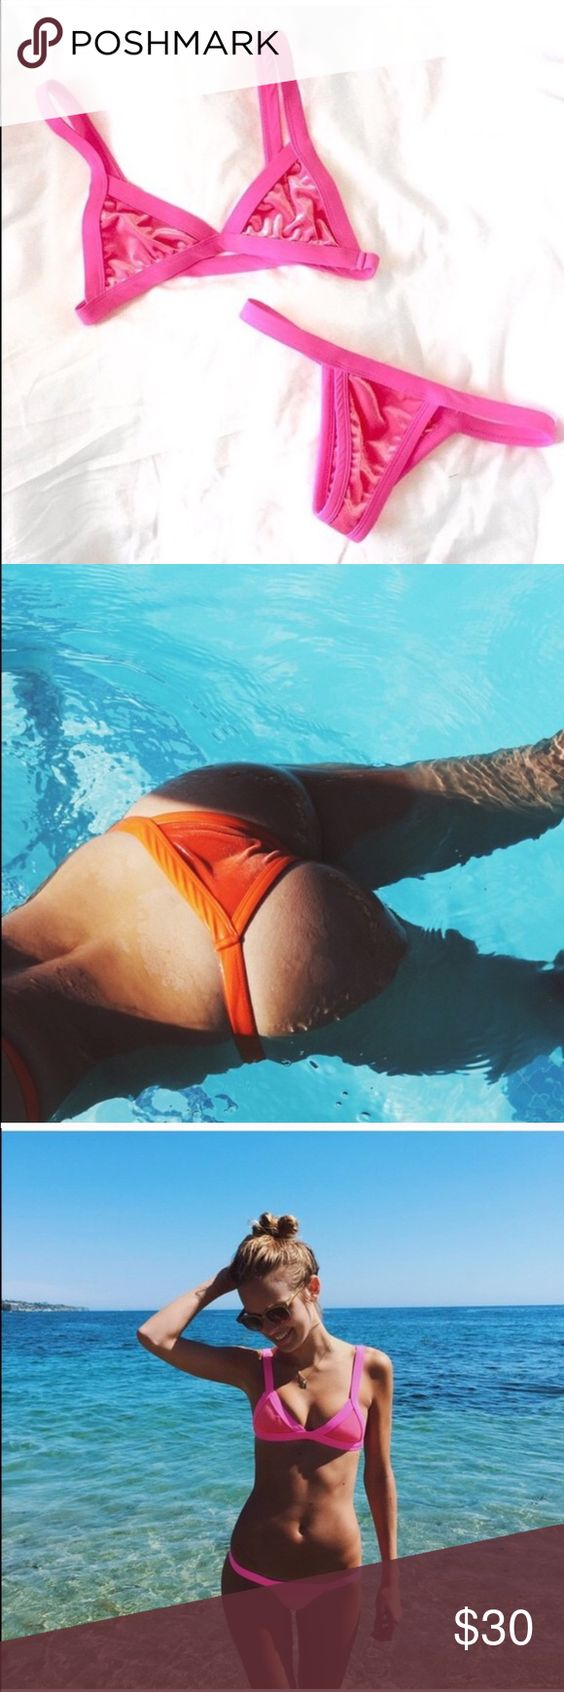 KAOHS Swim Cindy bottom in Pink! NWT! Super cute! Brand new velvet bottoms! KAOHS Swim